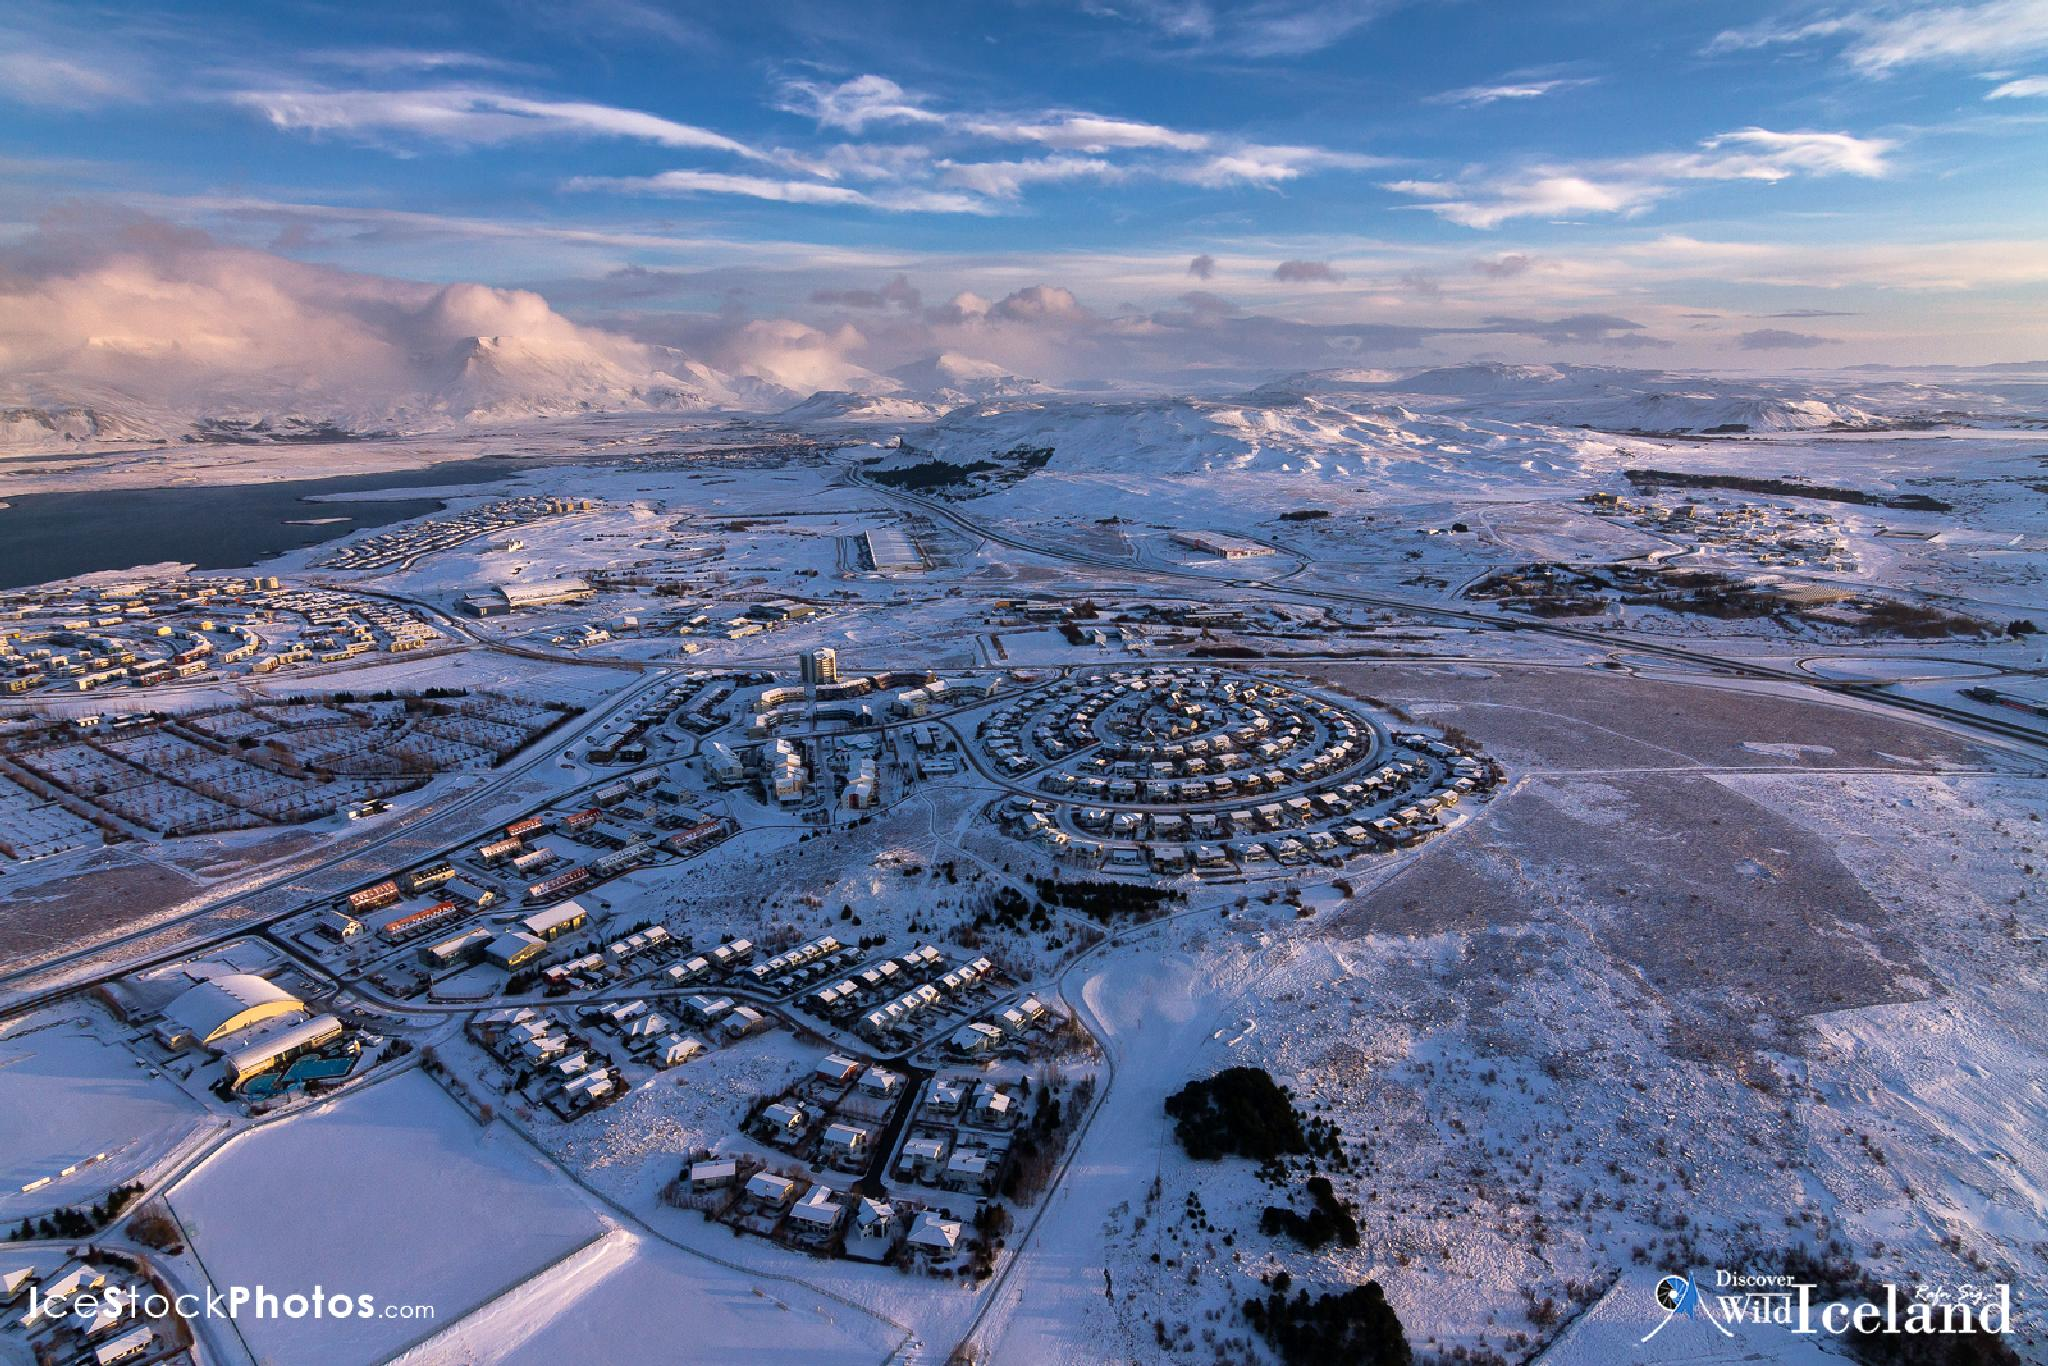 Discover Wild Iceland – Like Reykjavík in winter by Rafn Sig,-  @ Discover Wild Iceland.com